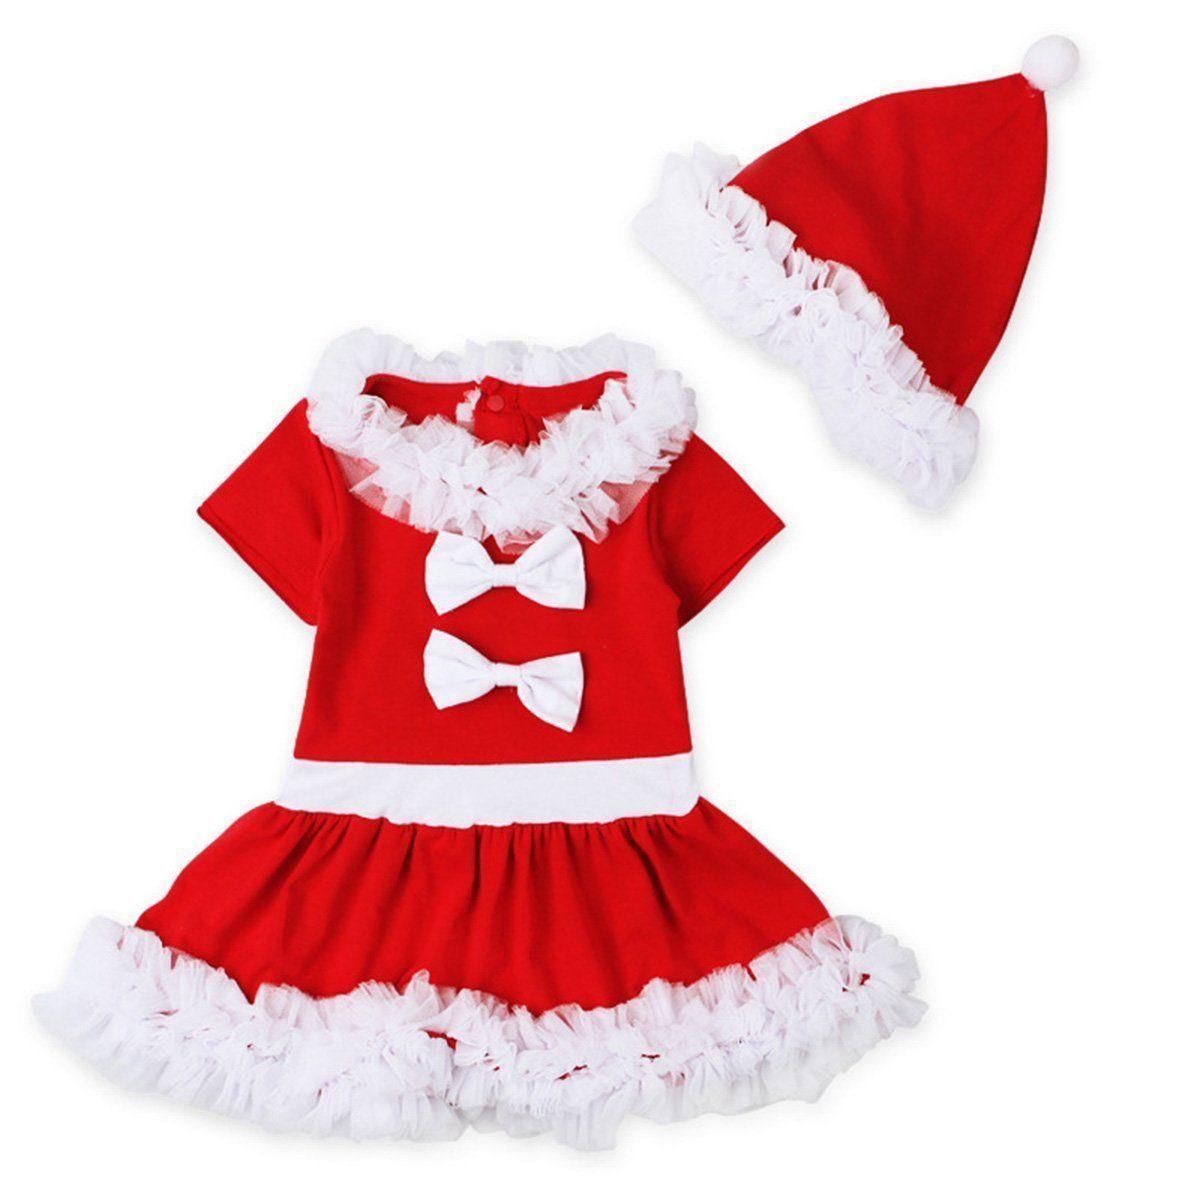 $8.29 - Toddler Baby Girls Christmas Claus Santa Lace Dress Hat ...